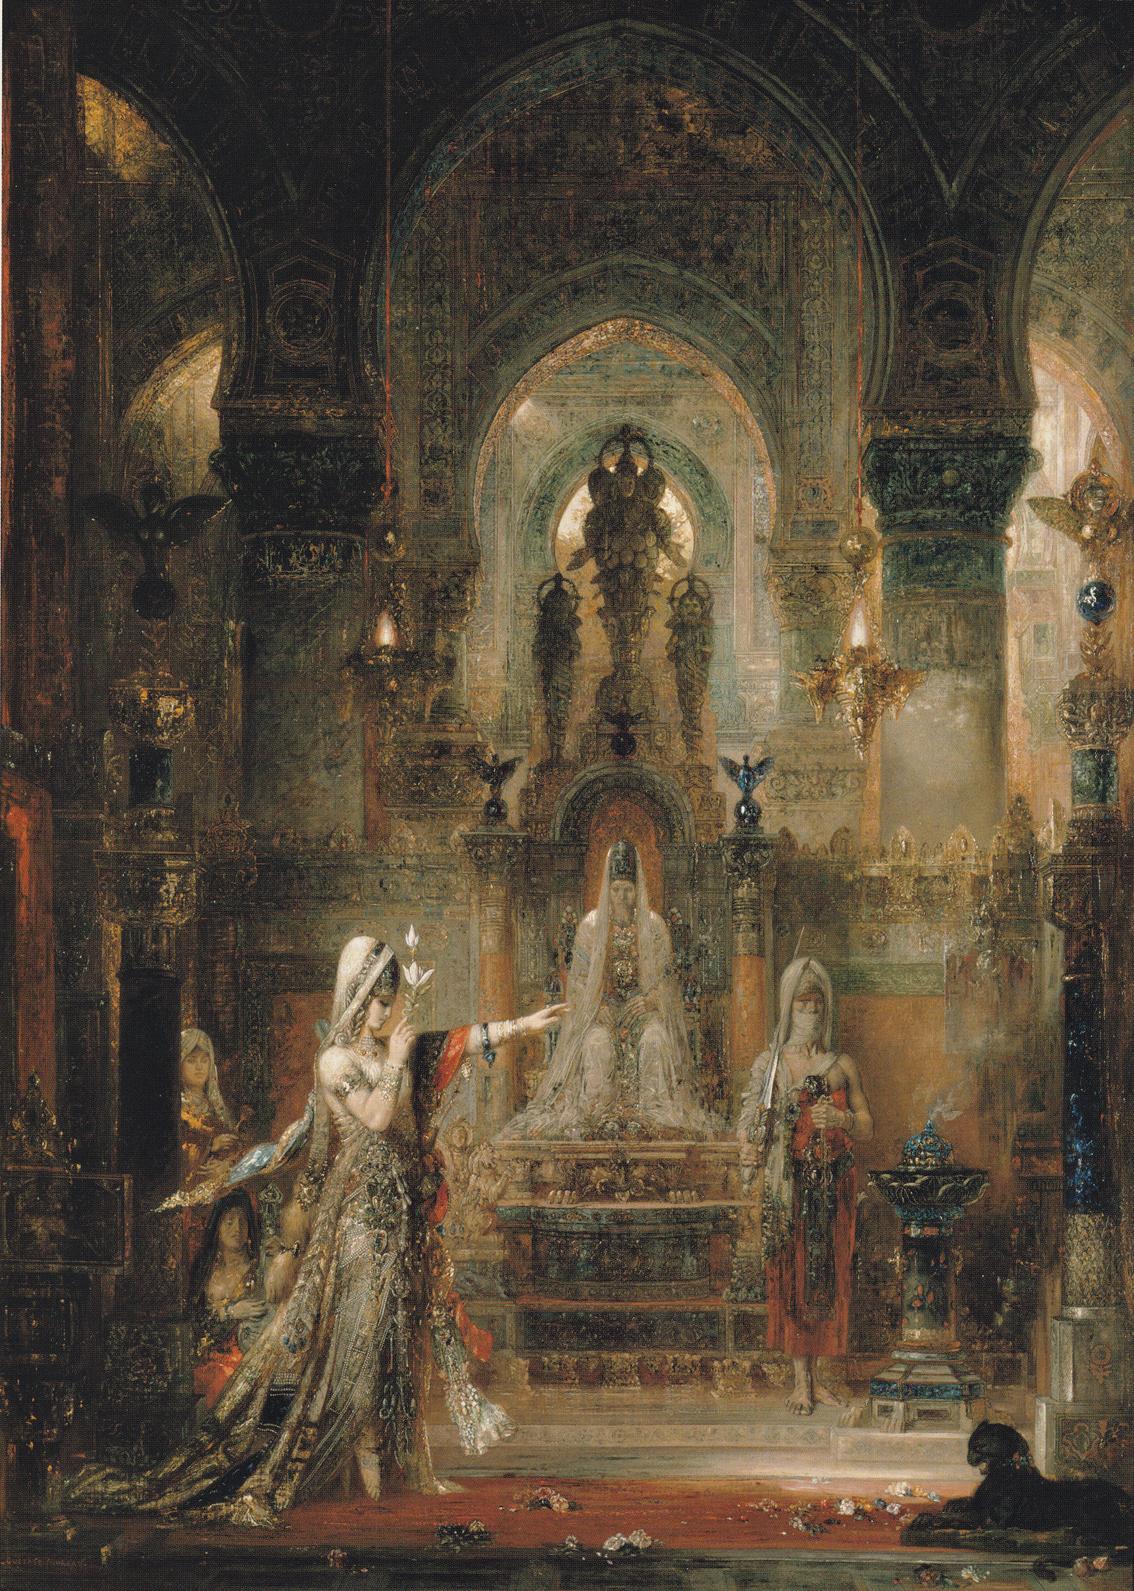 Salomé danzando delante de Herodes, de Gustave Moreau, 1874-76, óleo sobre lienzo, 143,5 x 104,3 cm, The Armand Hammer Collection; Gift of the Armand Hammer Foundation, Hammer Museum, Los Angeles. Photo: Robert Wedemeyer.